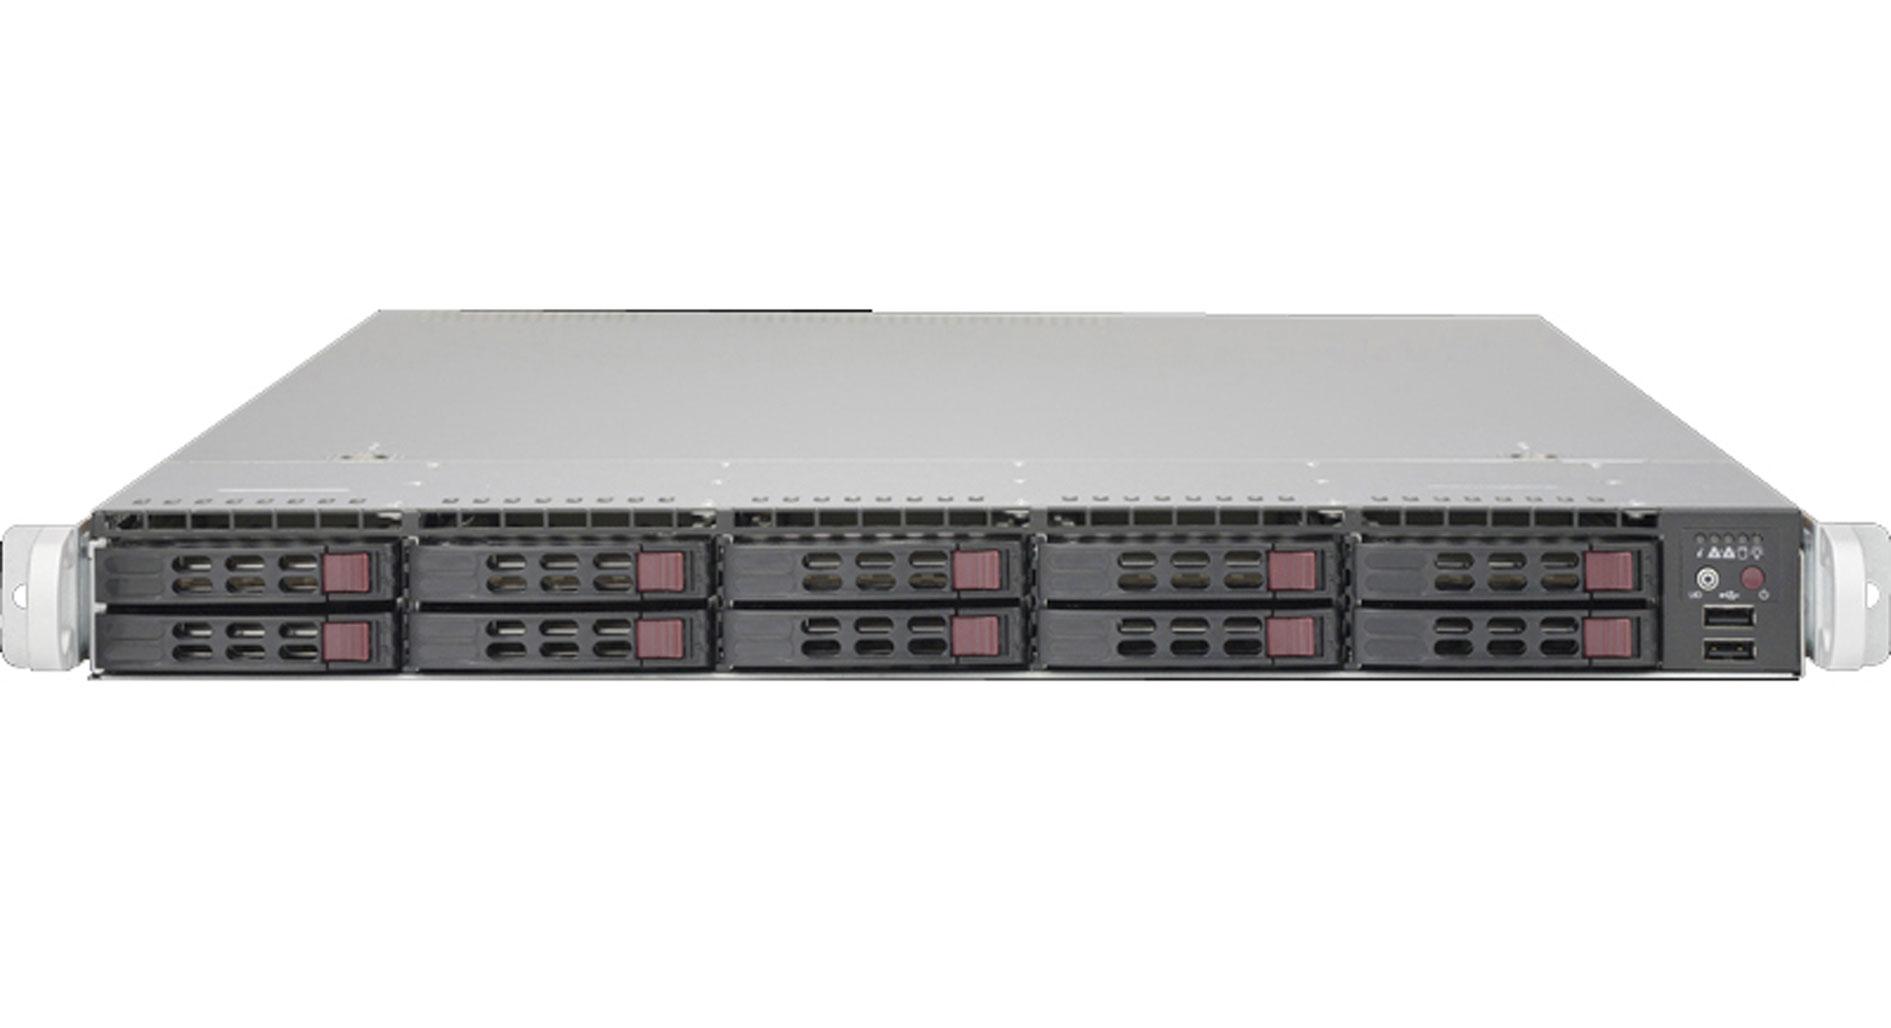 SuperMicro Dual Xeon E5 SuperServer image